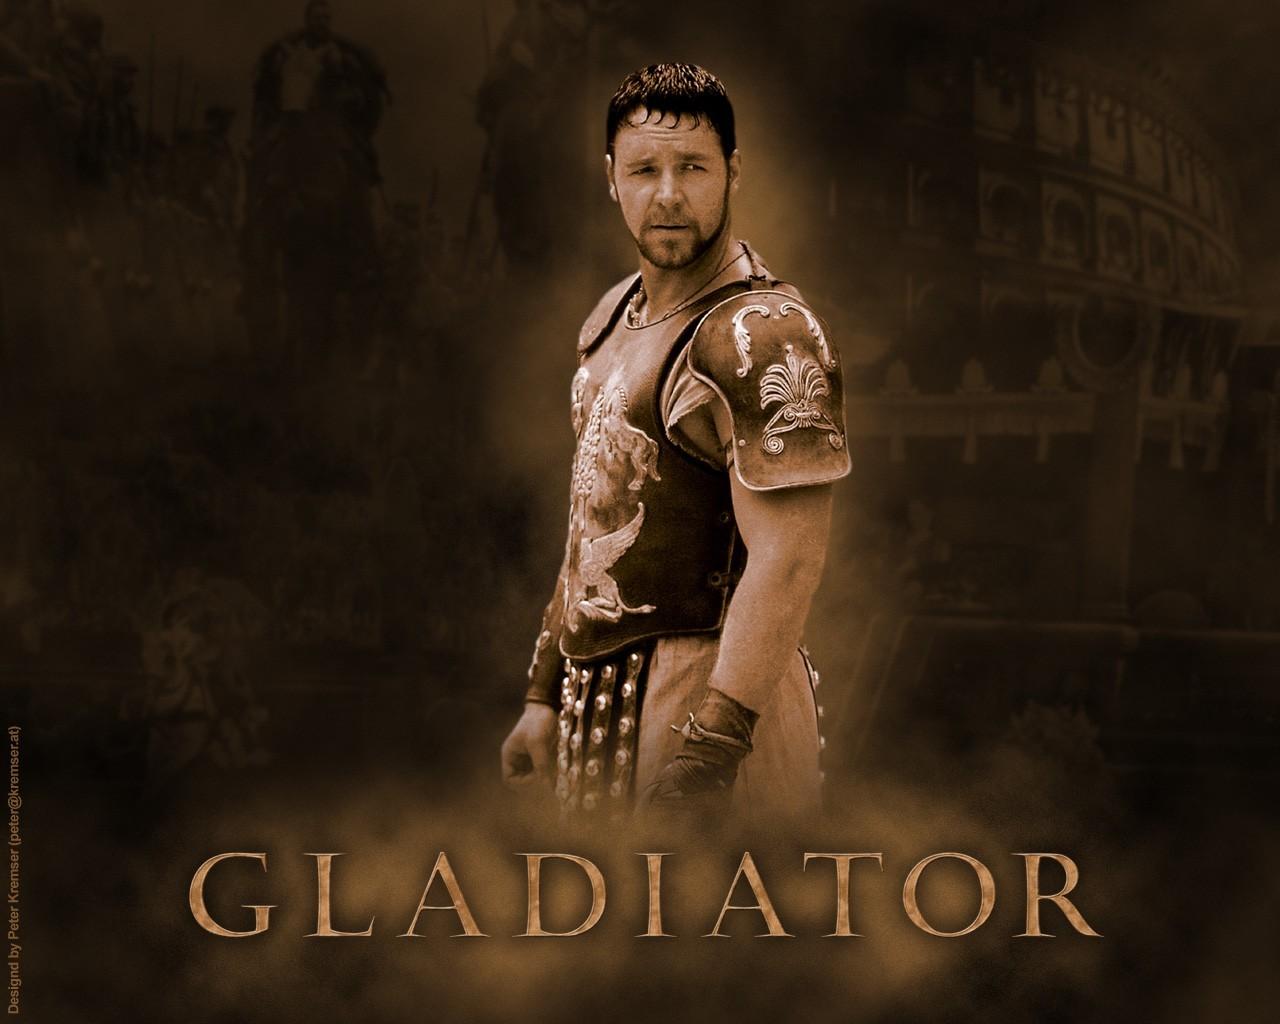 http://4.bp.blogspot.com/-vglbmSYwwmQ/TaNBJ0PfIUI/AAAAAAAAAmY/NqHT9fGOUGw/s1600/russel_crow_gladiator.jpg